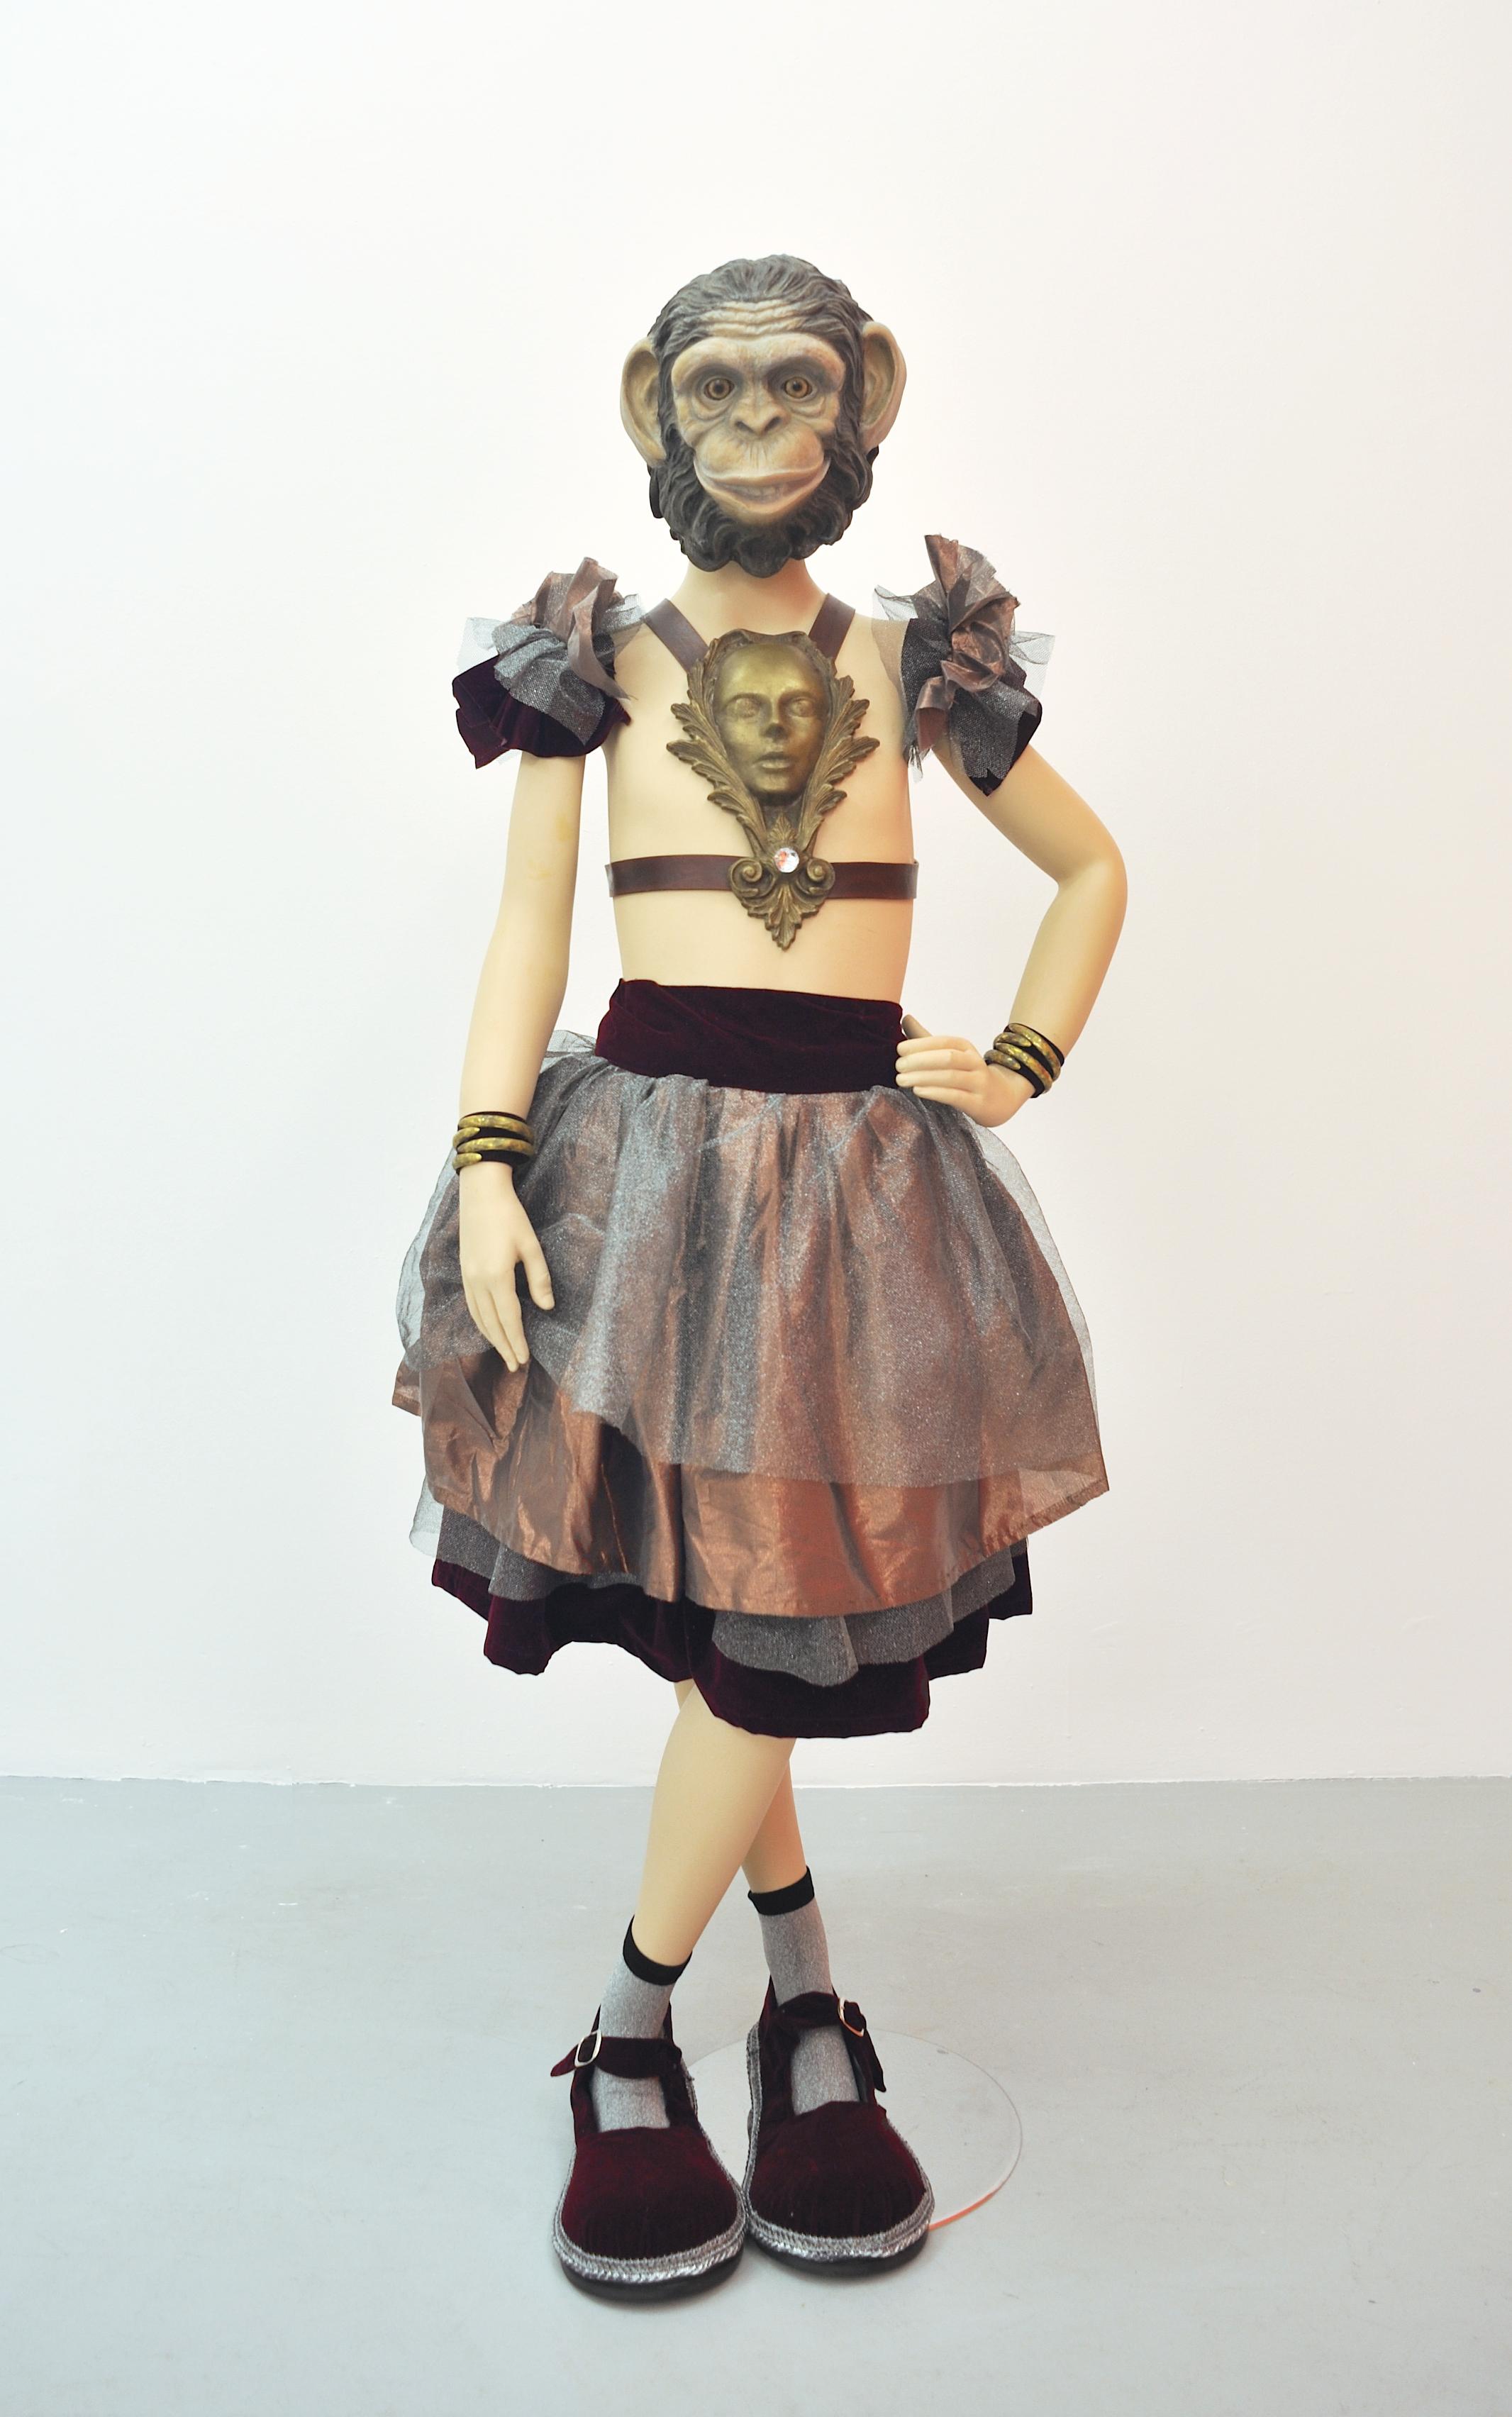 The Chimp, 2008 foam, aqua resin, surfacing veil, plastic, cold cast metal, leather, epoxy, hand sewn costume & acrylic paint on fiberglass mannequin 148,6 x 53,5 x 53,5 cm - 58 1/2 x 21 x 21 inches